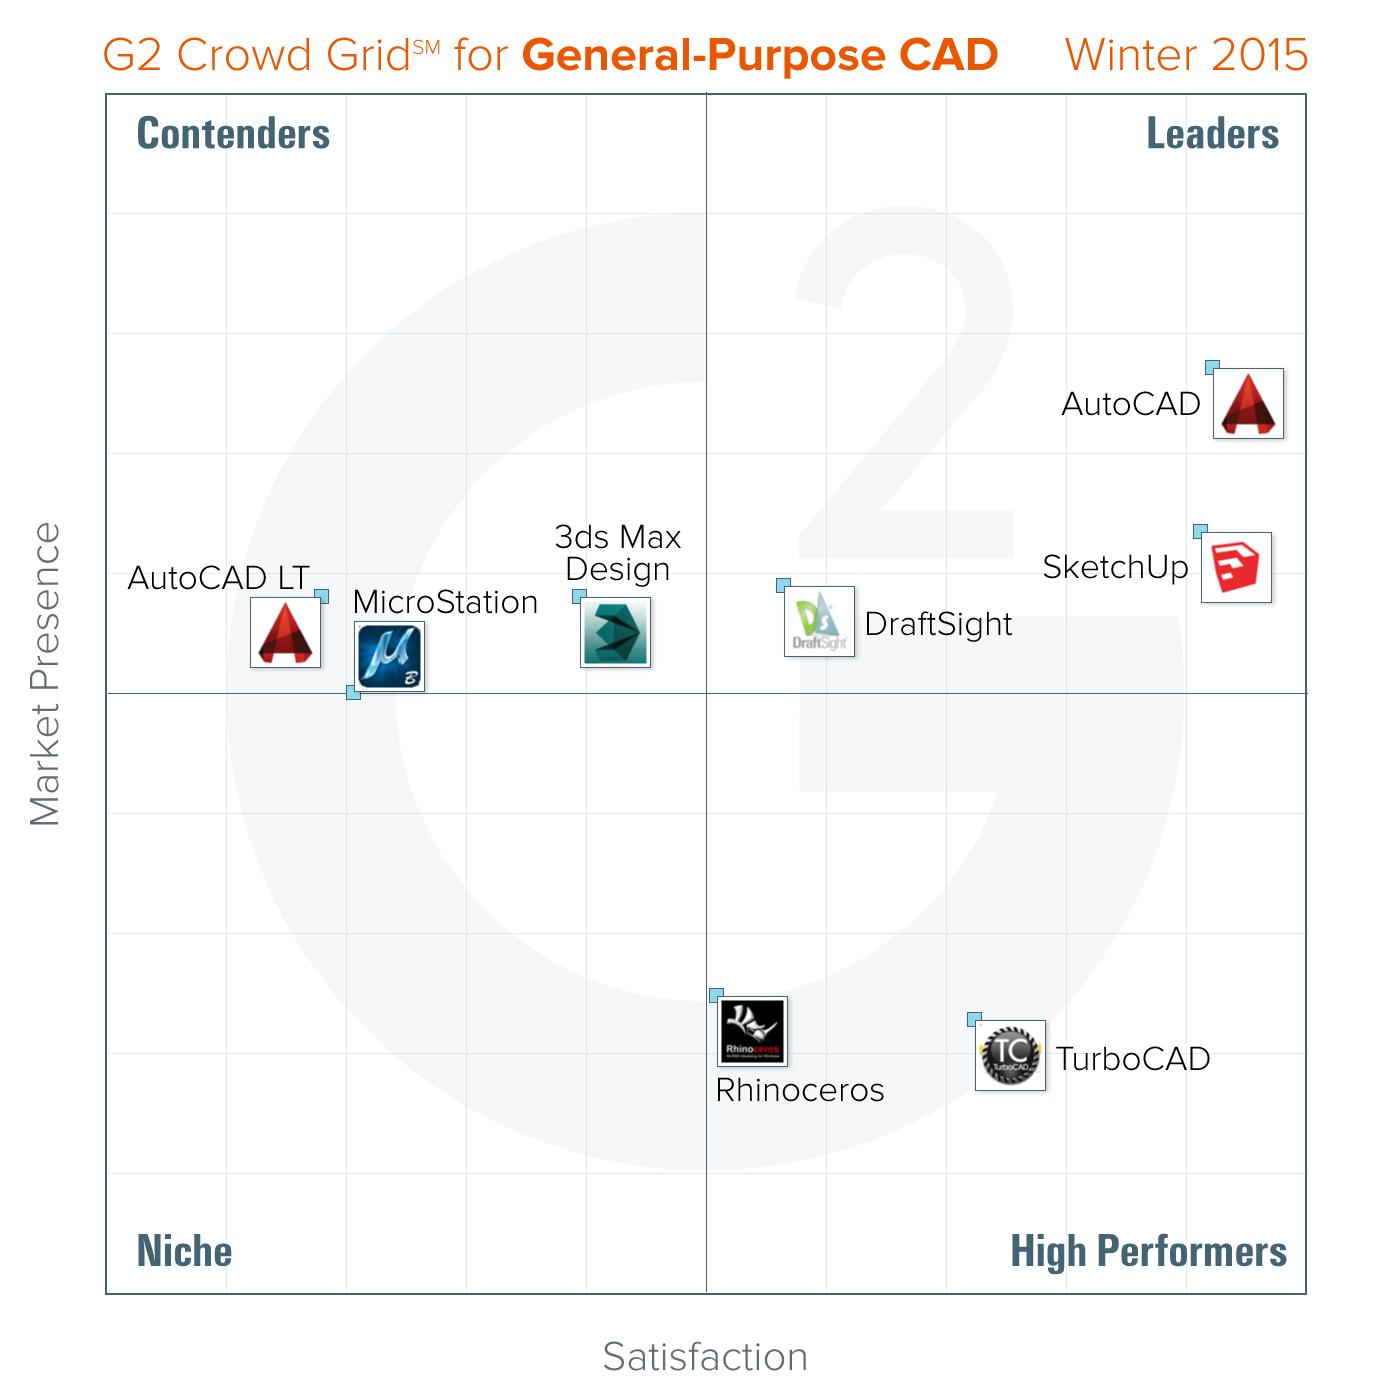 Best General Purpose Cad Software Winter 2015 Report